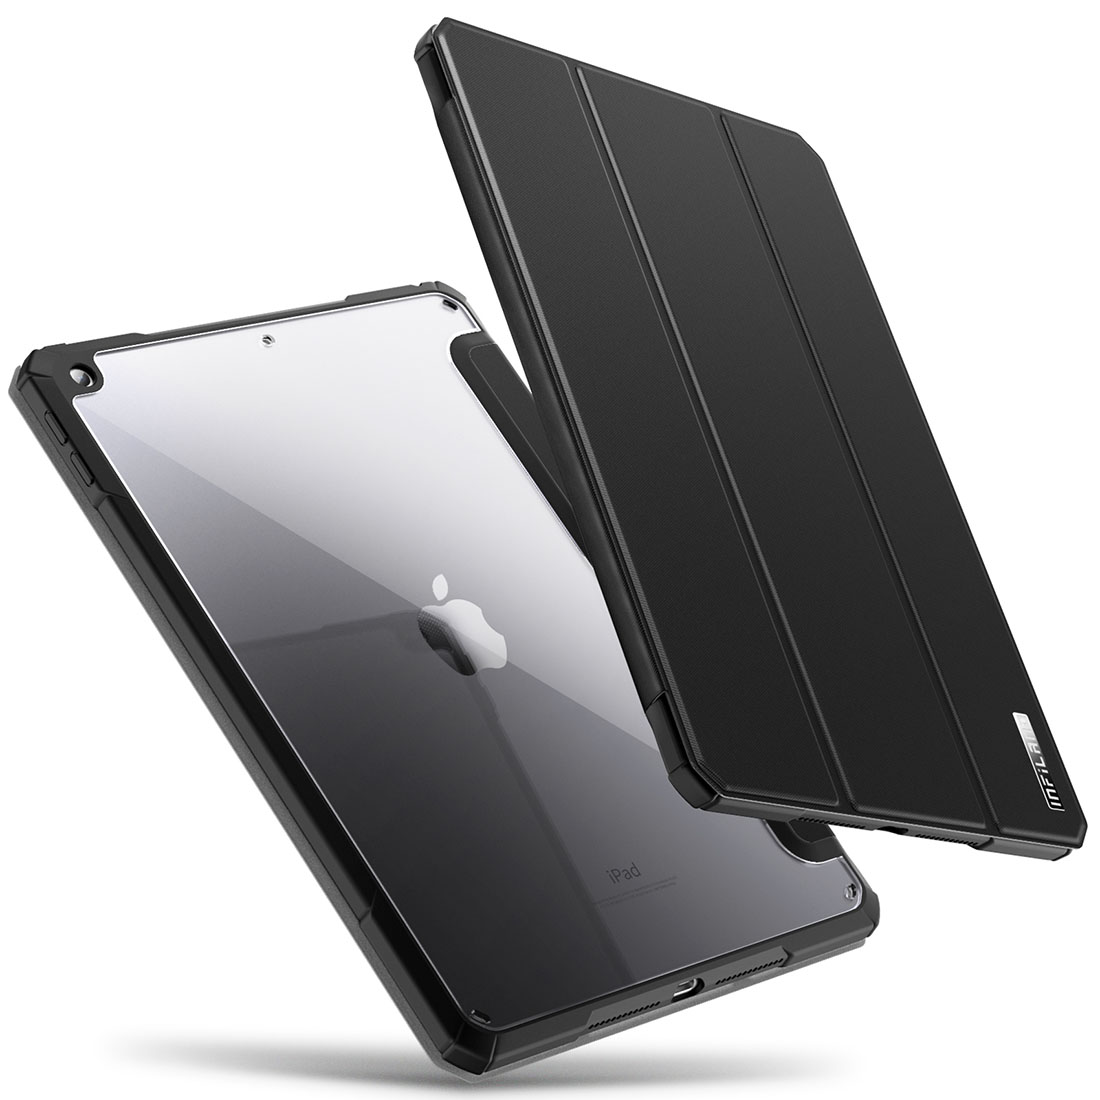 Capa iPad 7 10.2 Premium 2019 A2197 A2200 c/ Wake Sleep